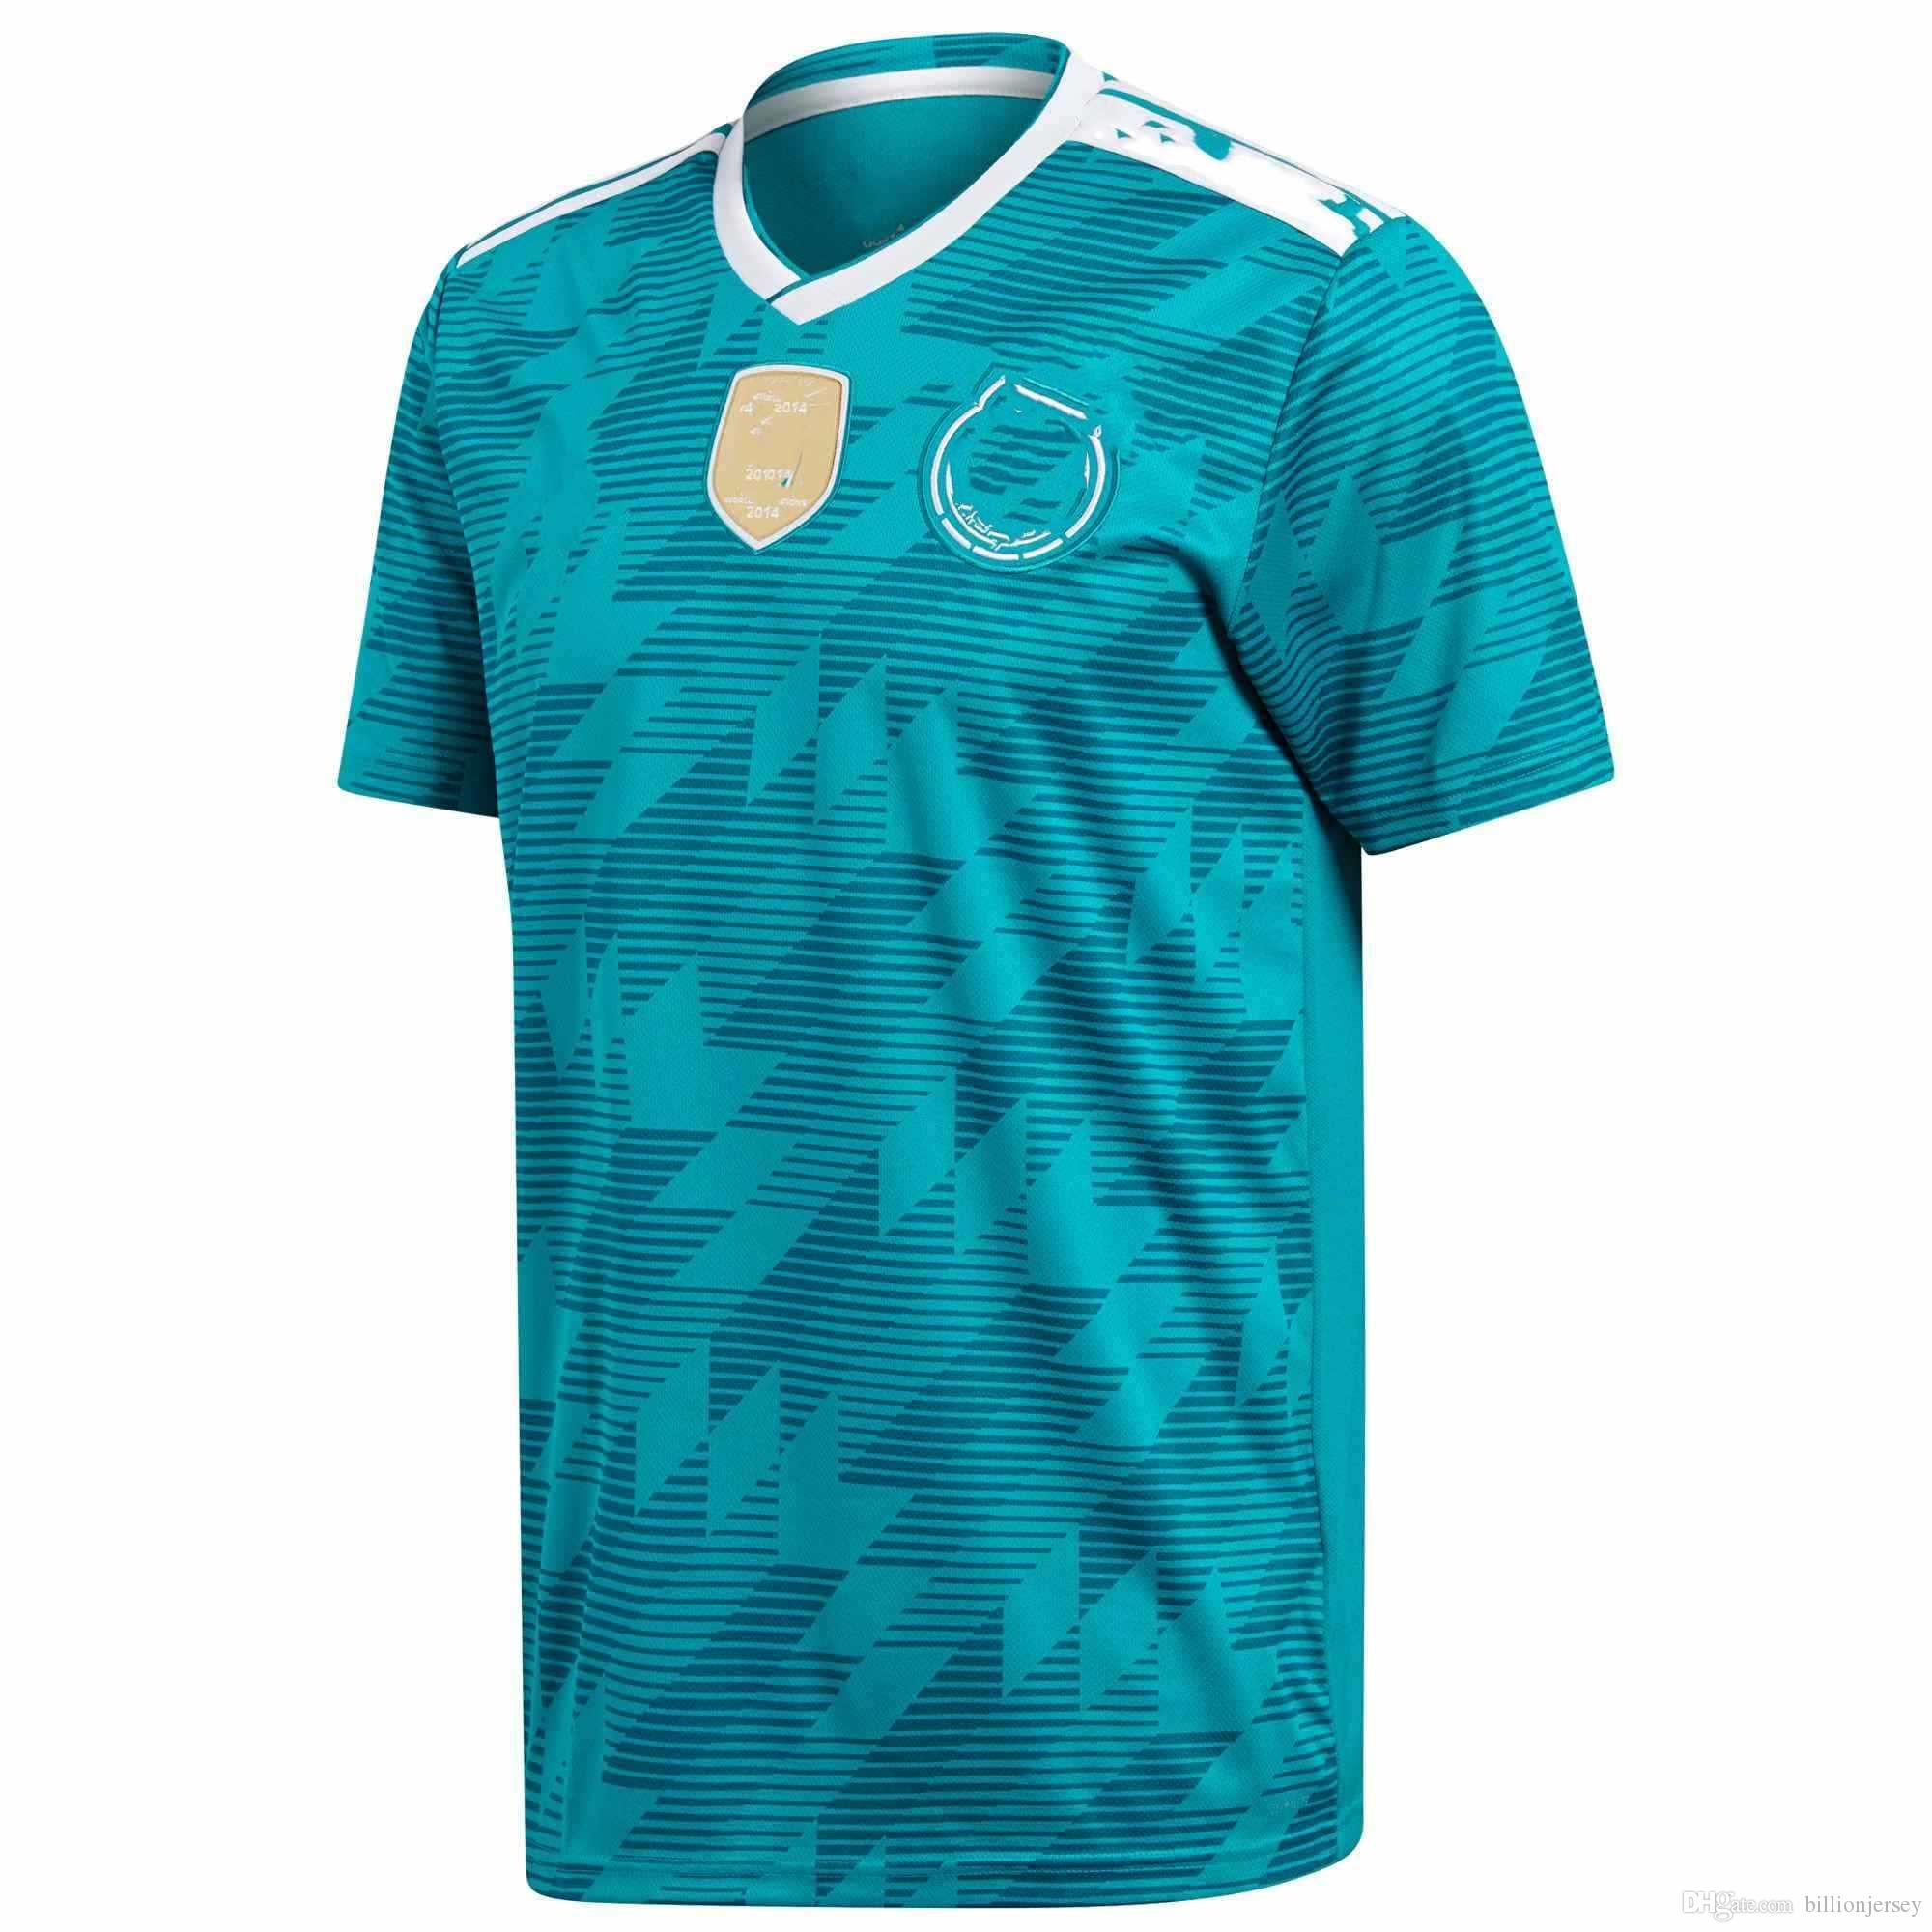 1ae189bedea 2019 2018 World Cup Germany Away National Team Soccer Jerseys Football T Shirt  Jerseys Size S XL Customized Item From Billionjersey